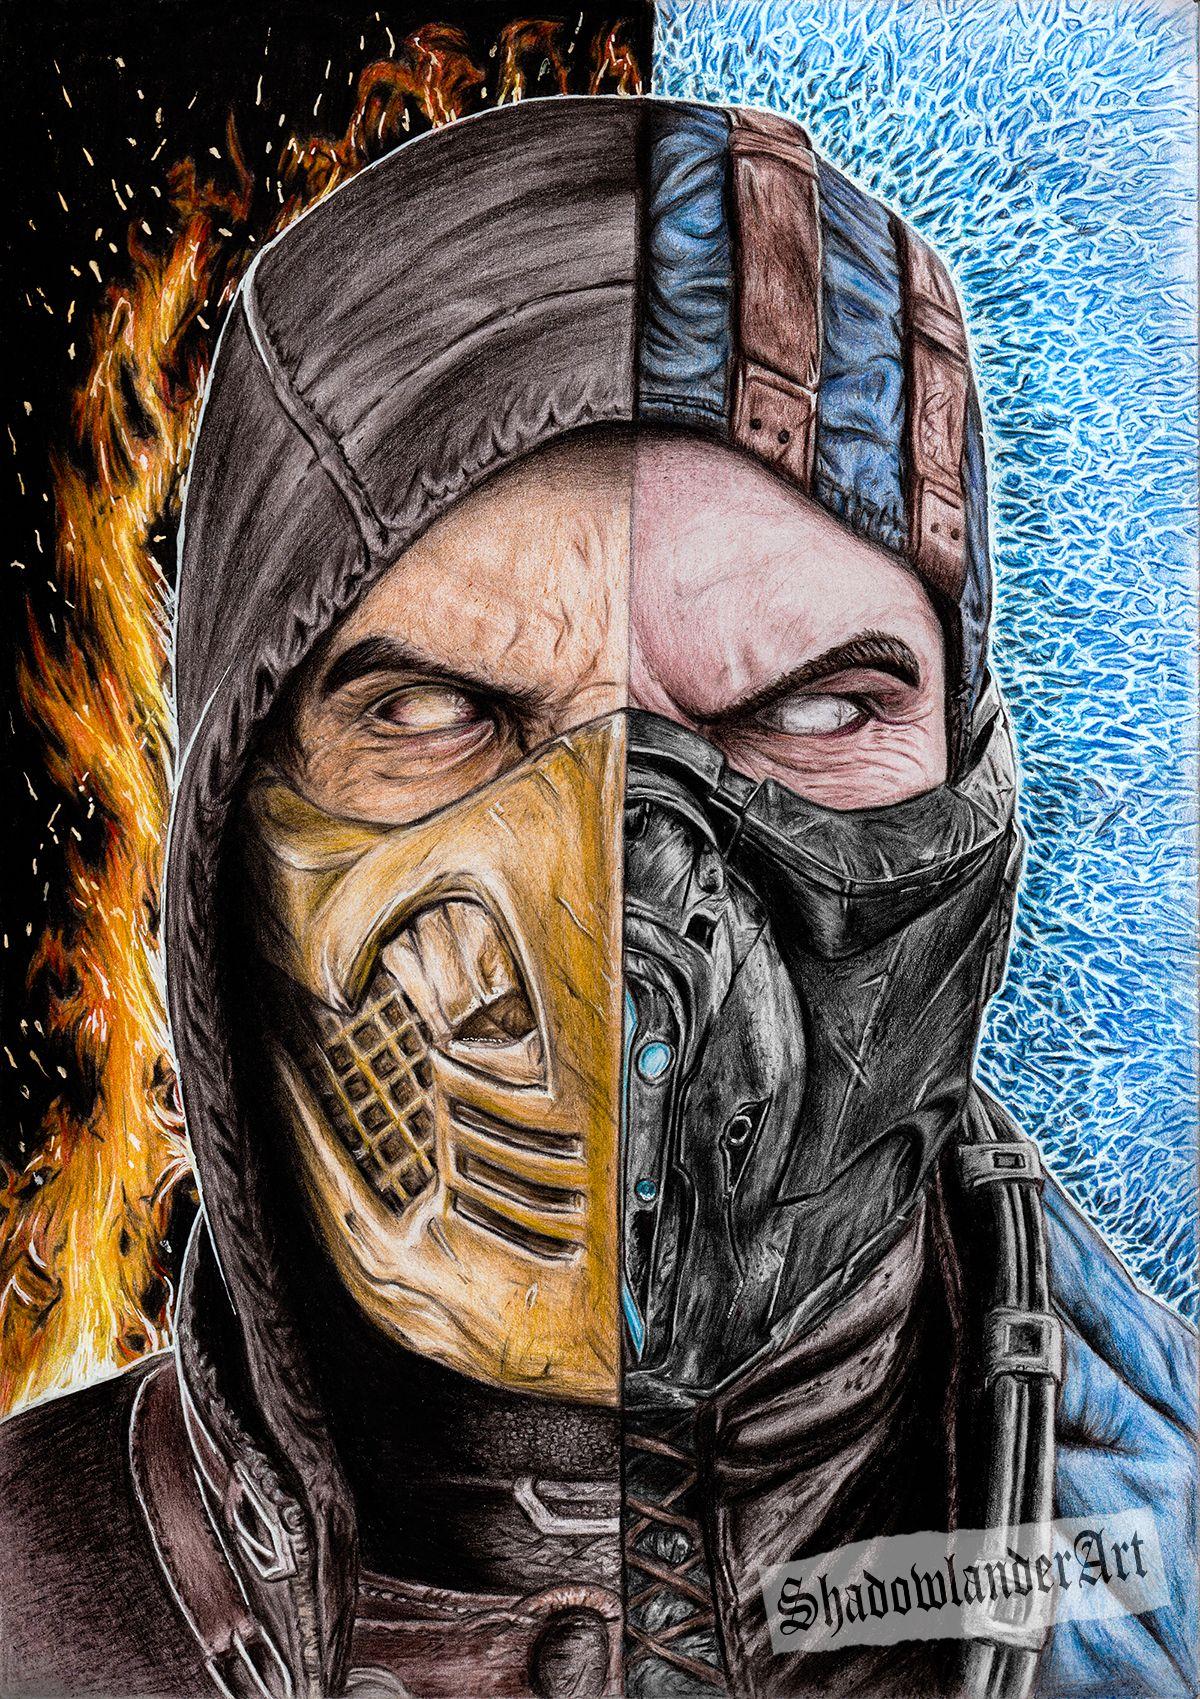 Mortal Kombat Scorpion Vs Sub Zero Drawing Art Print Mortal Kombat Art Mortal Kombat Drawings Sub zero vs scorpion mortal kombat